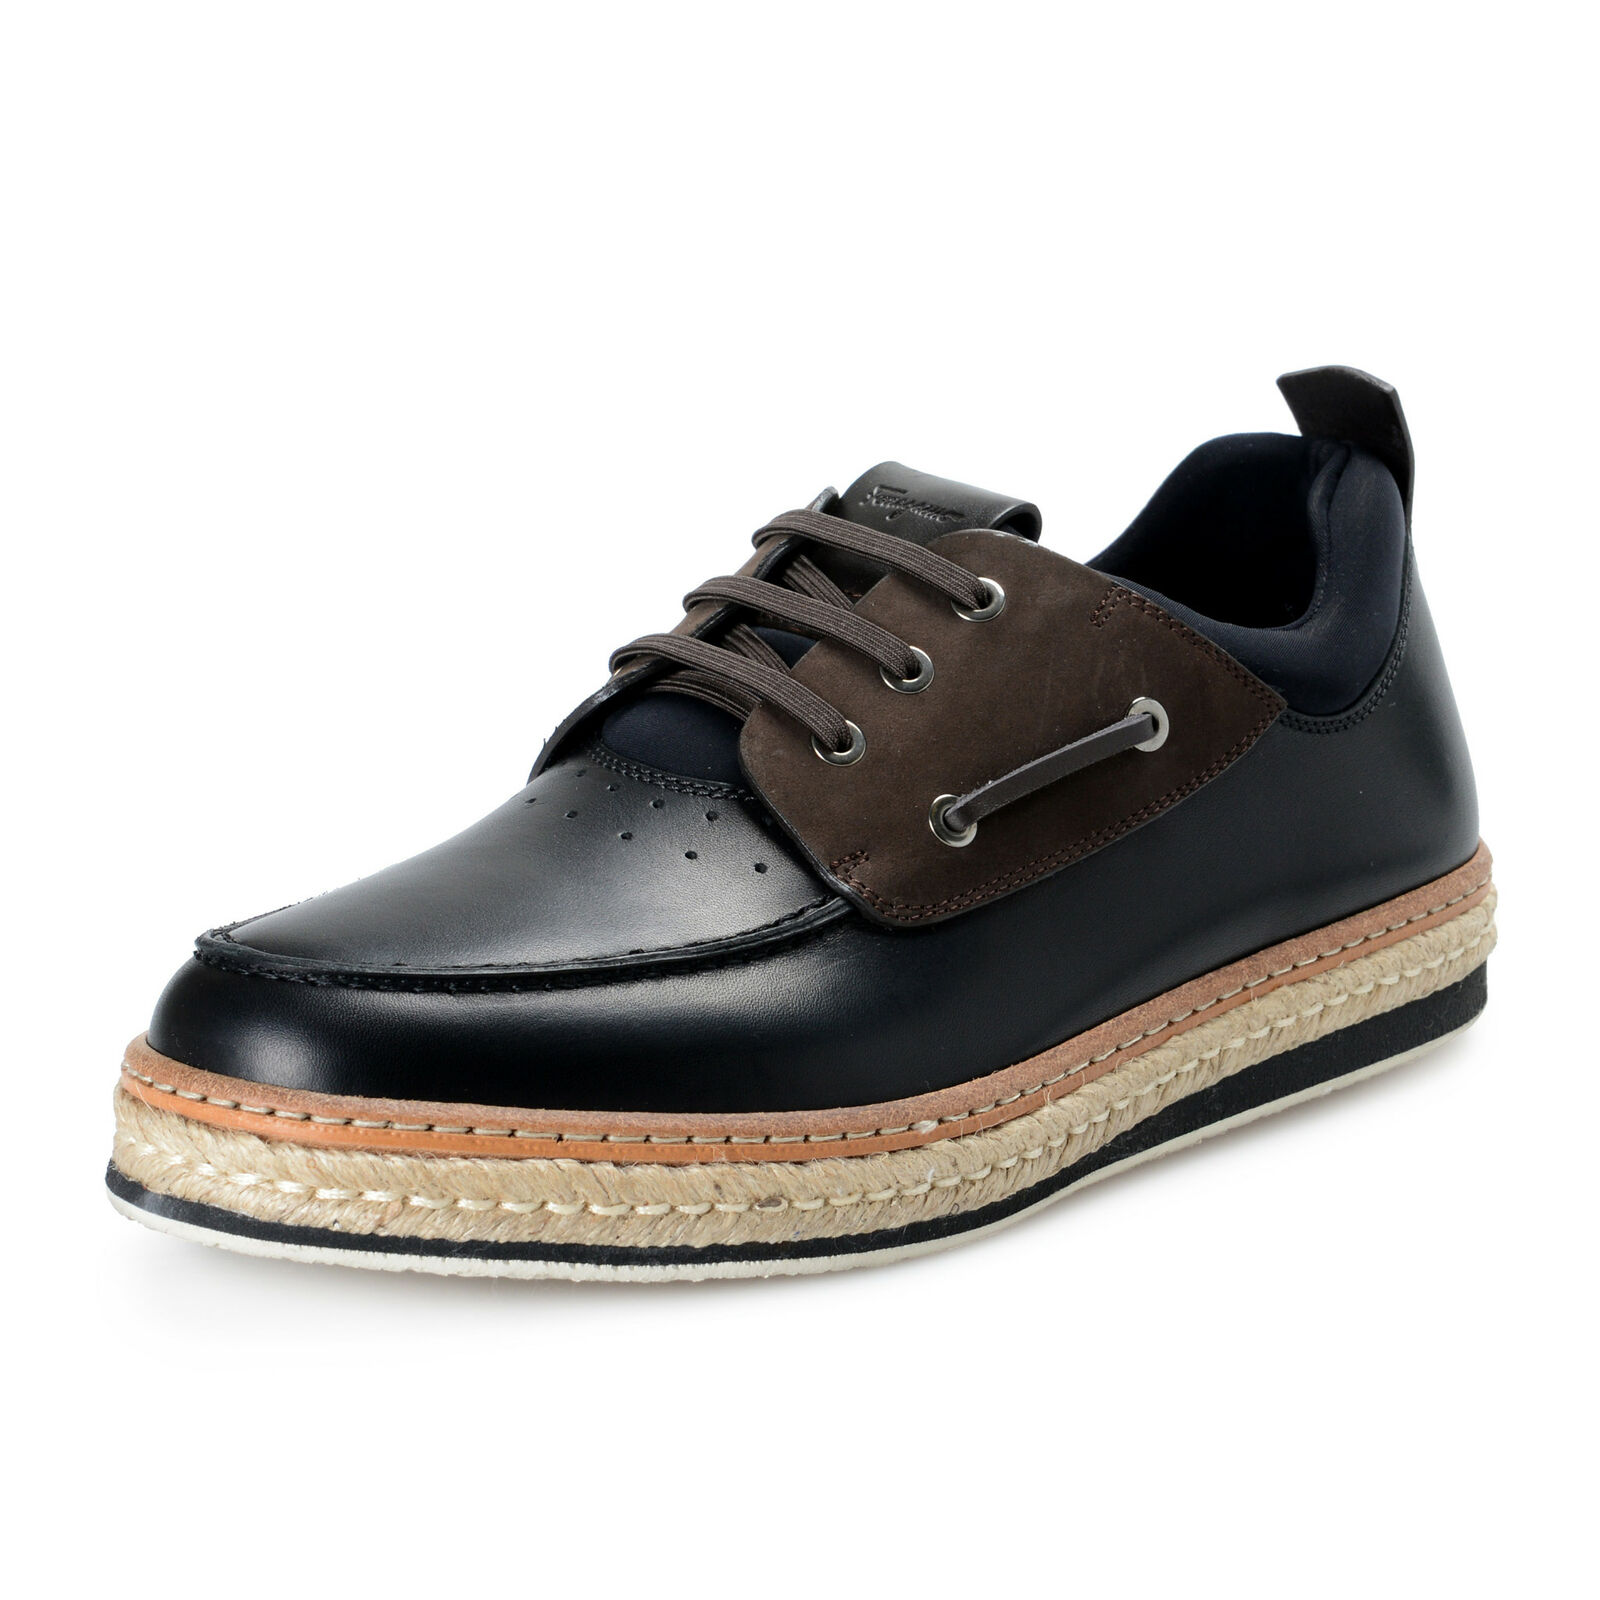 Salvatore Ferragamo Men's FIANO Leather Boat shoes sz 7.5 8 9.5 11 EE